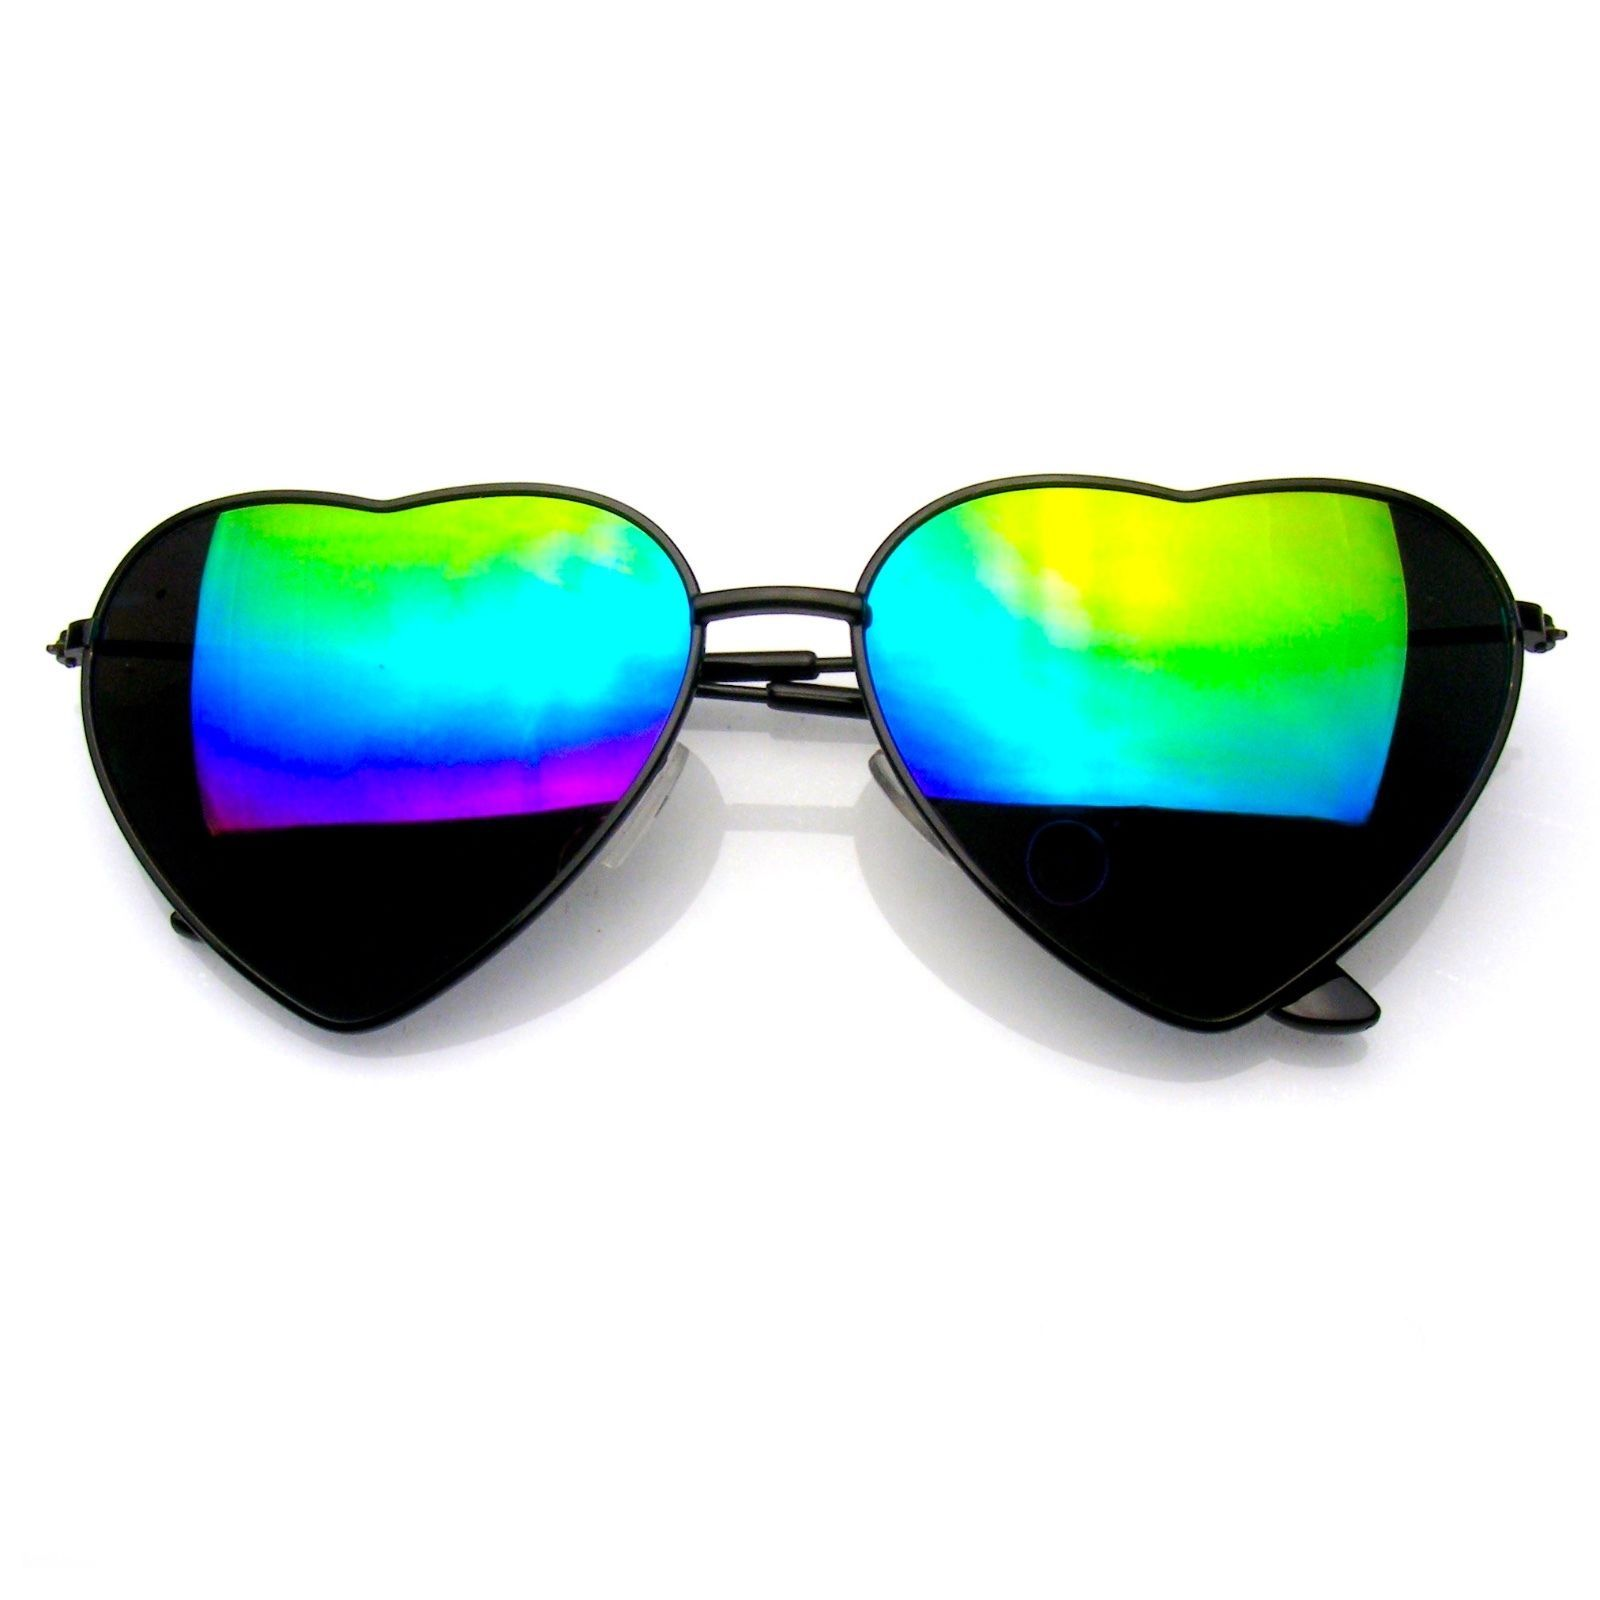 9ea2bf8a0f ... Vintage Retro Fashion Lolita Heart Shaped Aviator Frame Women Sunglasses  ...